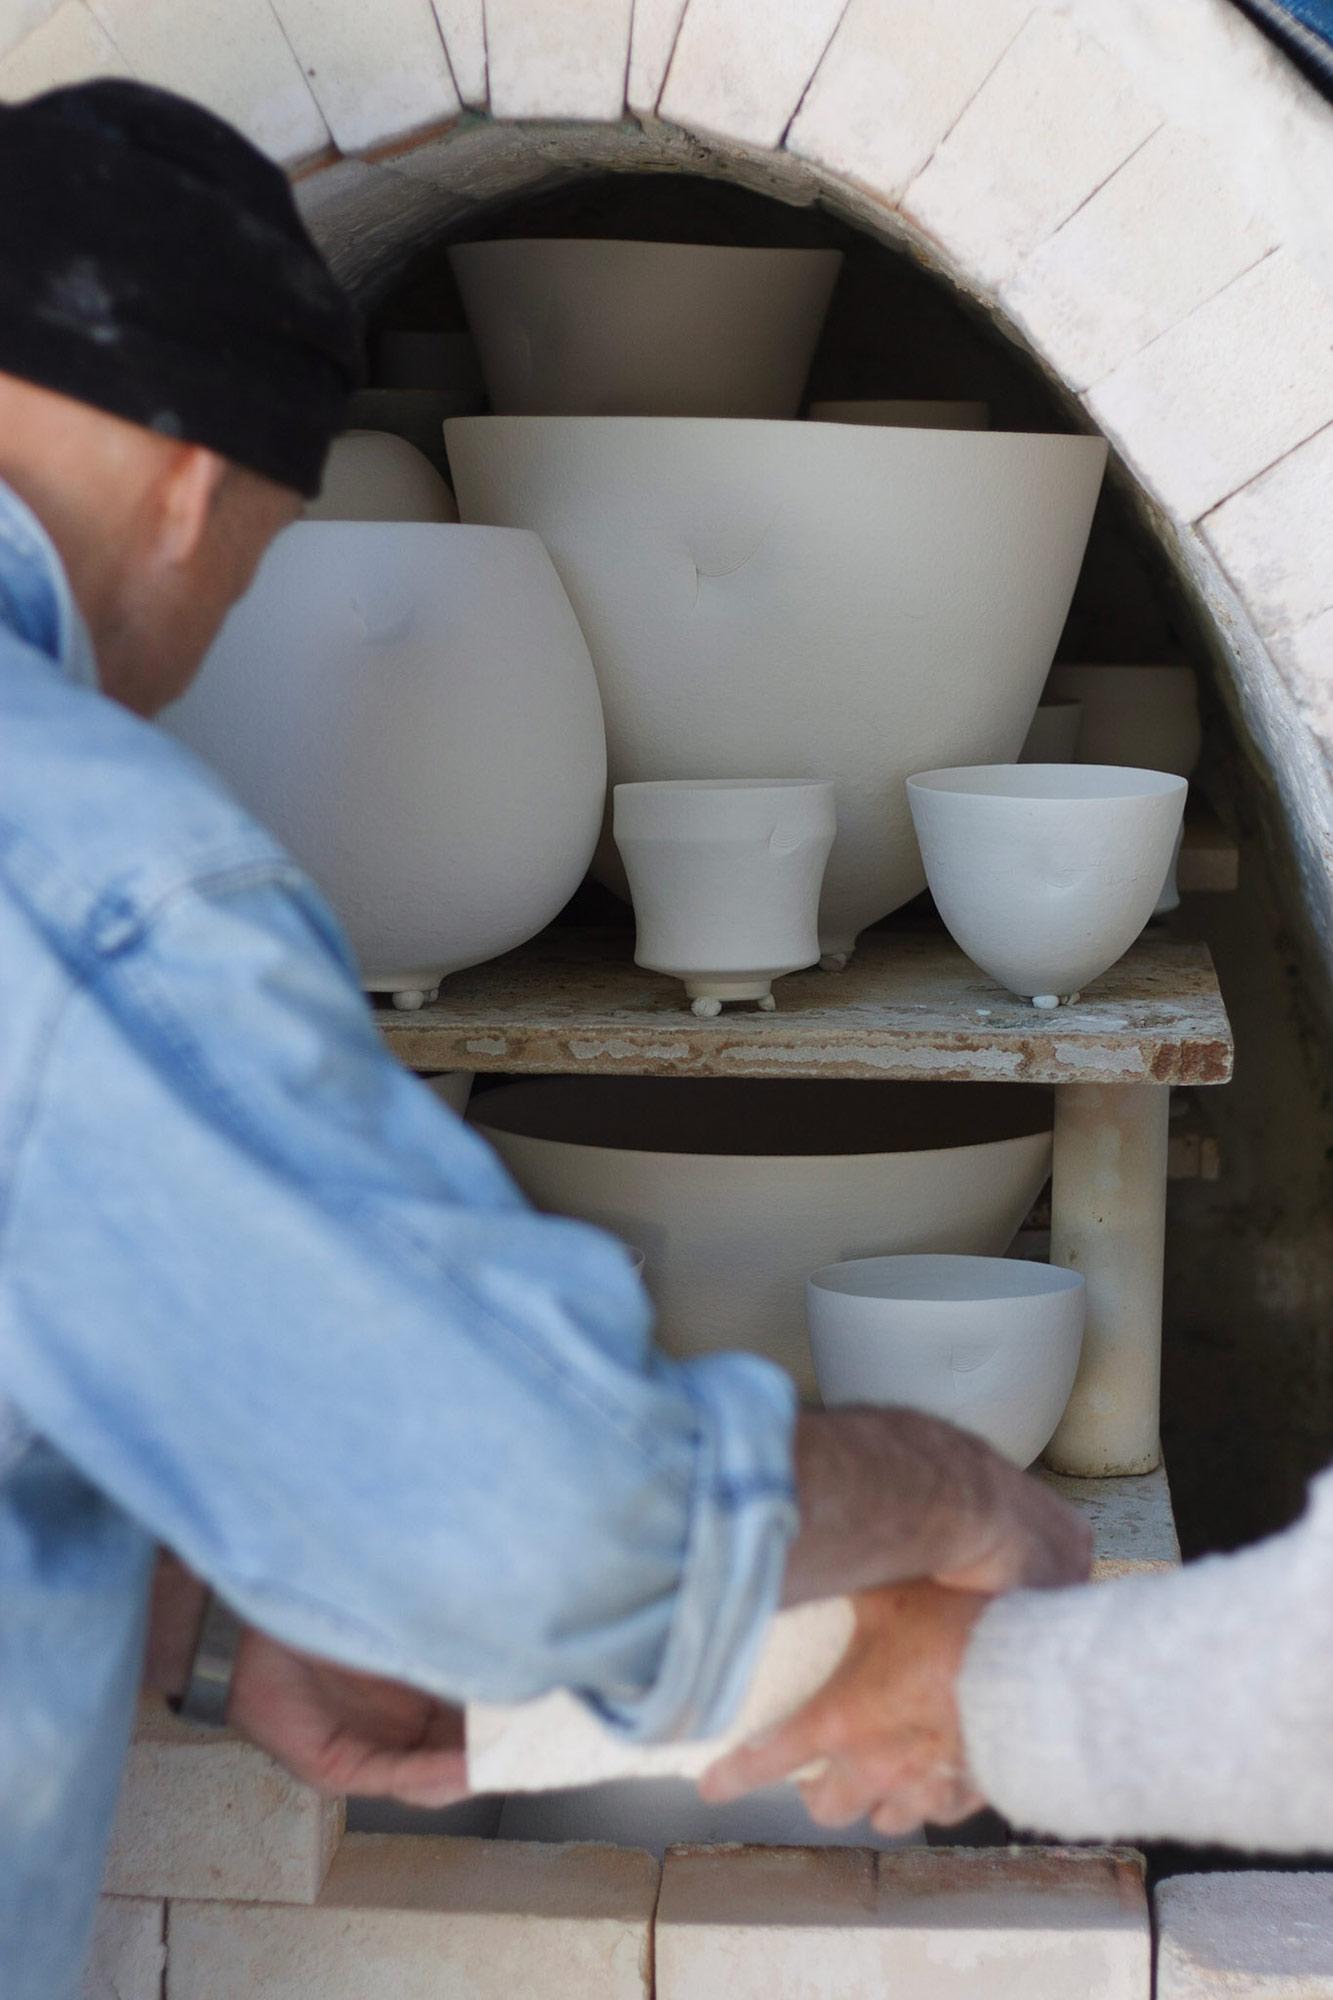 doherty-porcelain-new-studio-soda-04.jpg